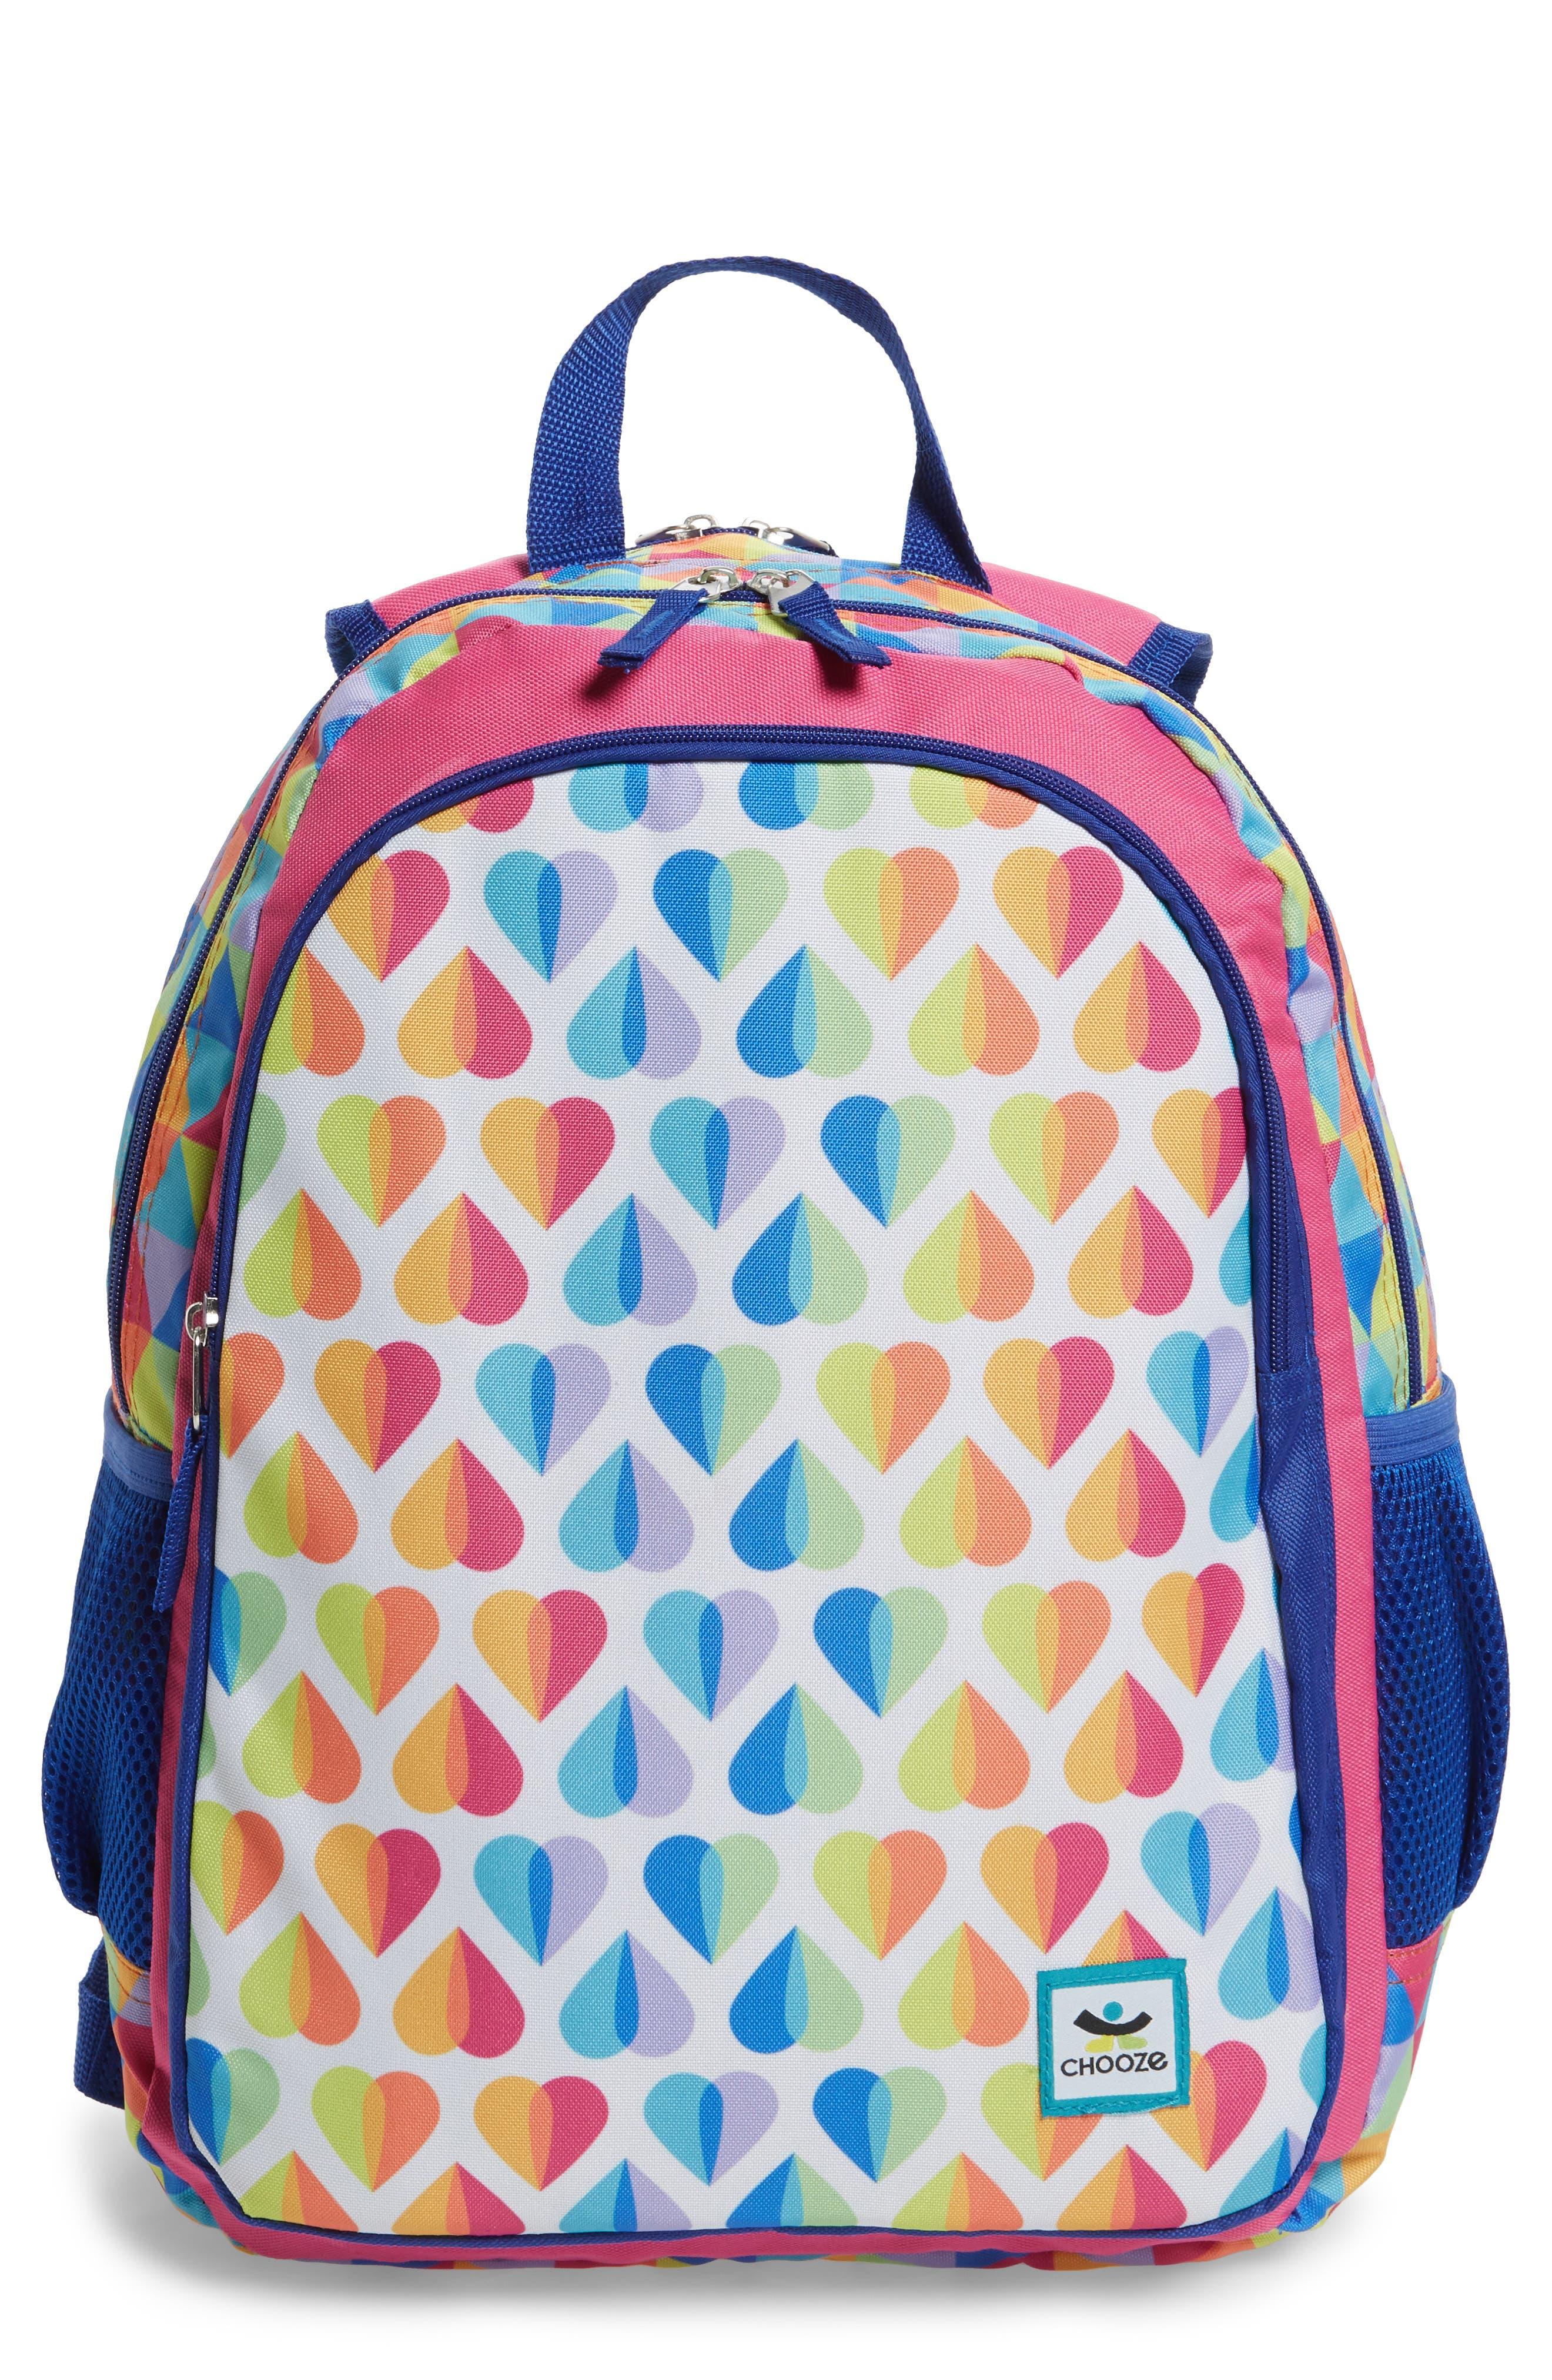 Reversible Backpack,                             Main thumbnail 1, color,                             Unity